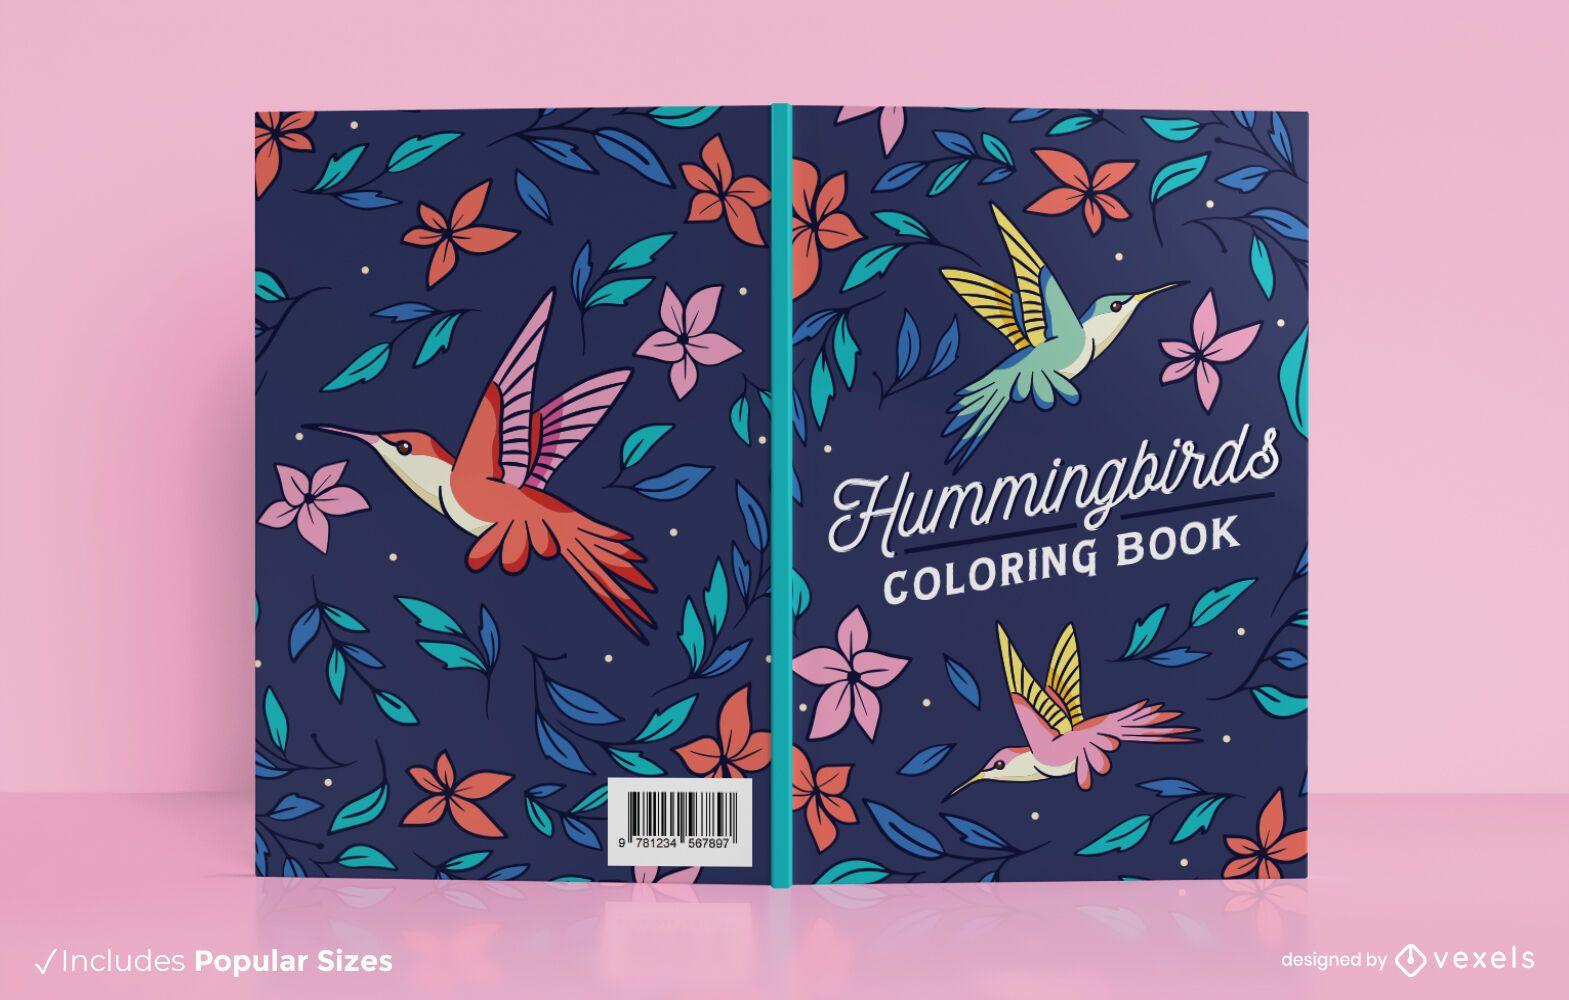 Dise?o de portada de libro de colibr?es